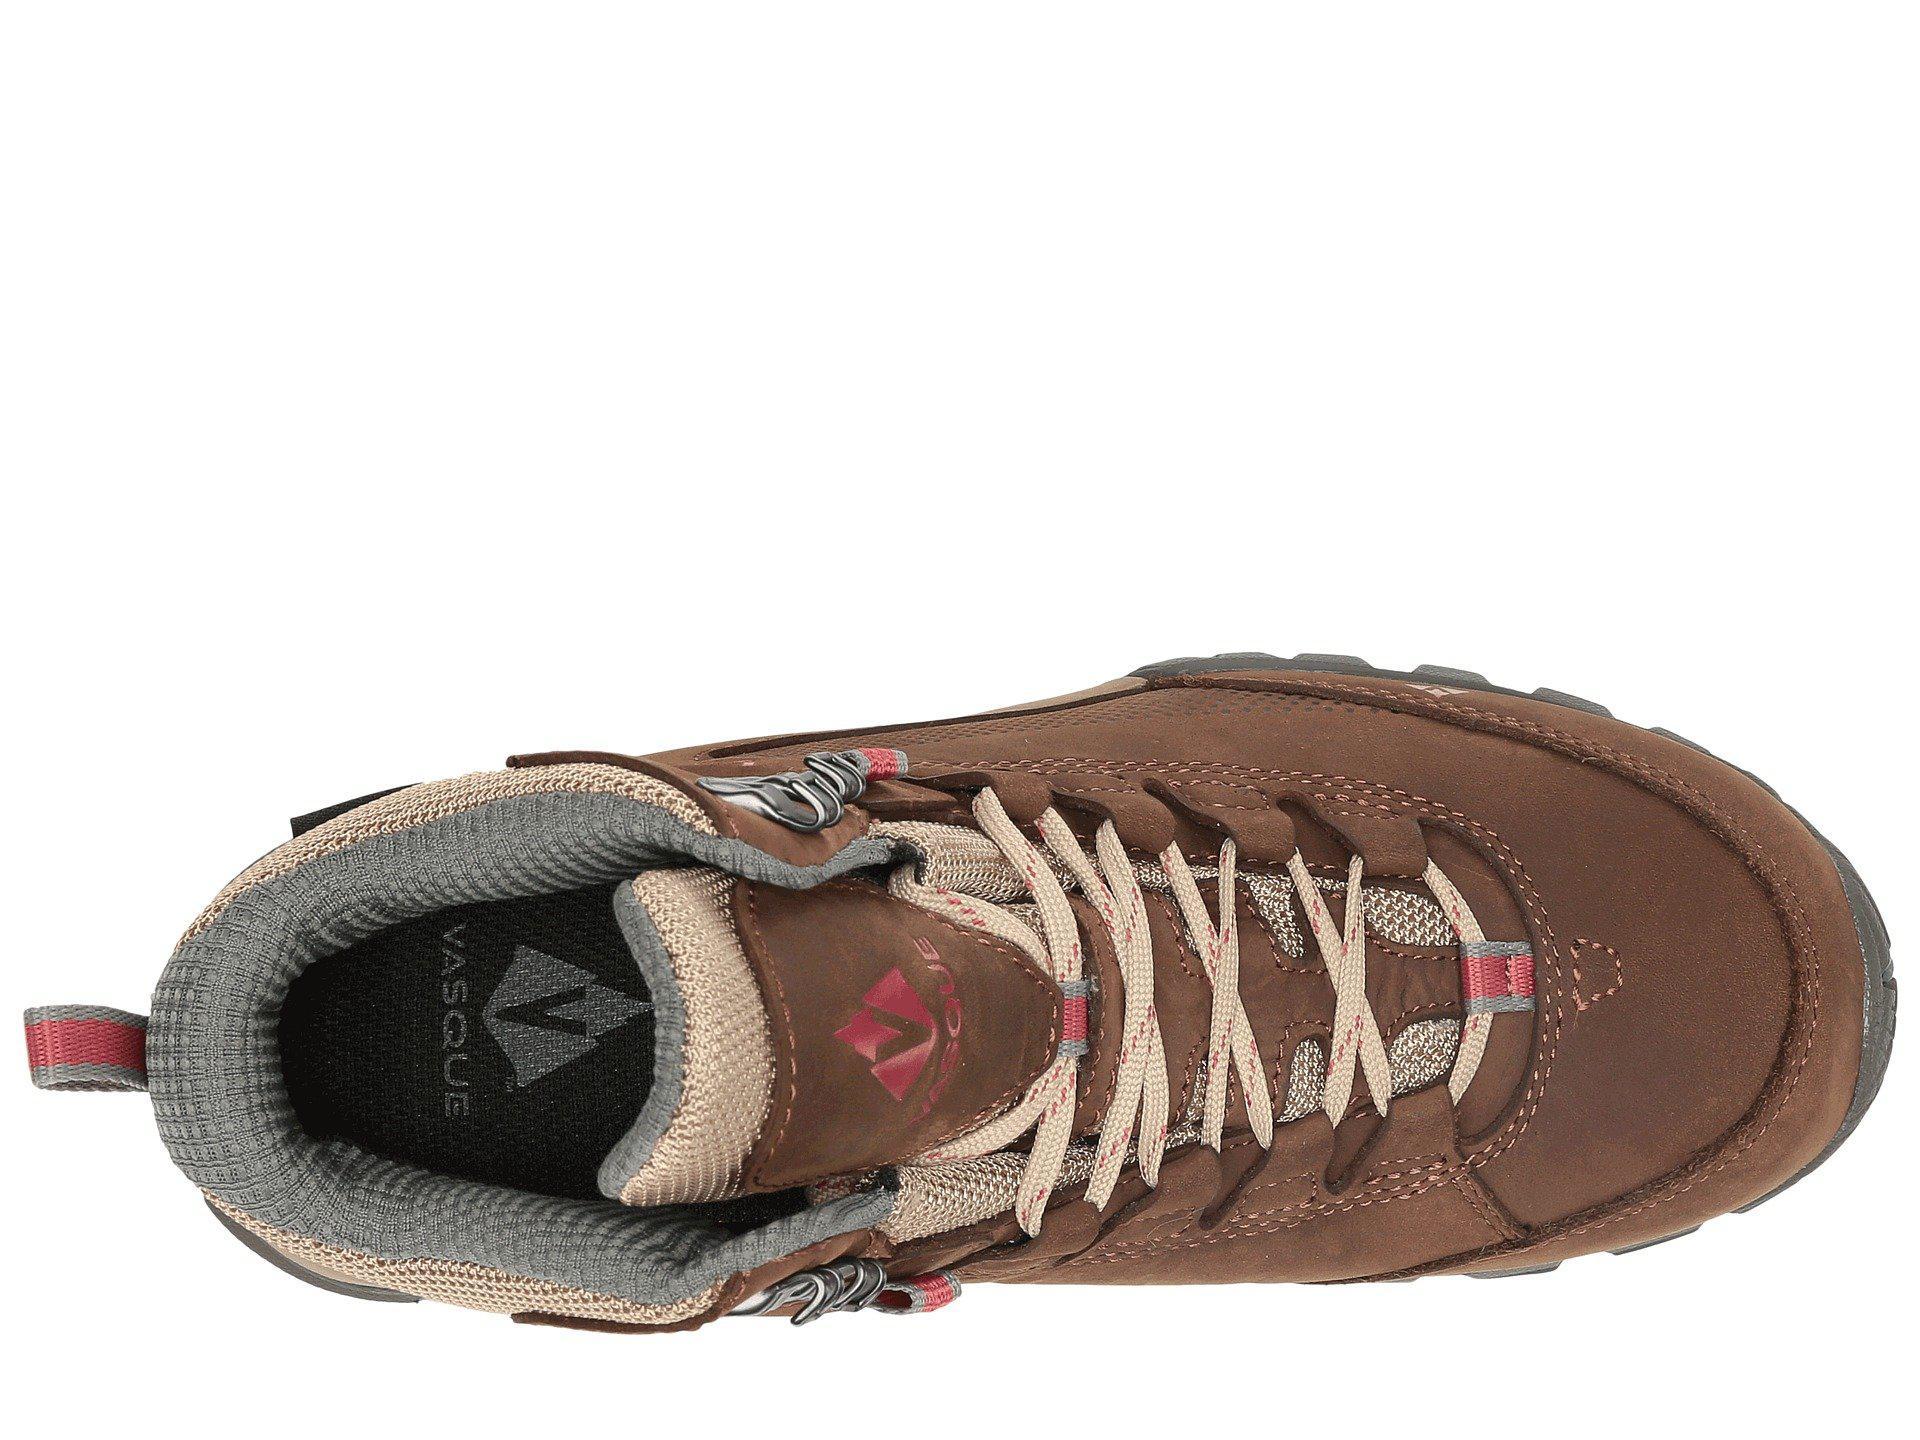 6ae6210e151 Lyst - Vasque Talus Trek Ultradrytm (gargoyle/damson) Women's Boots ...